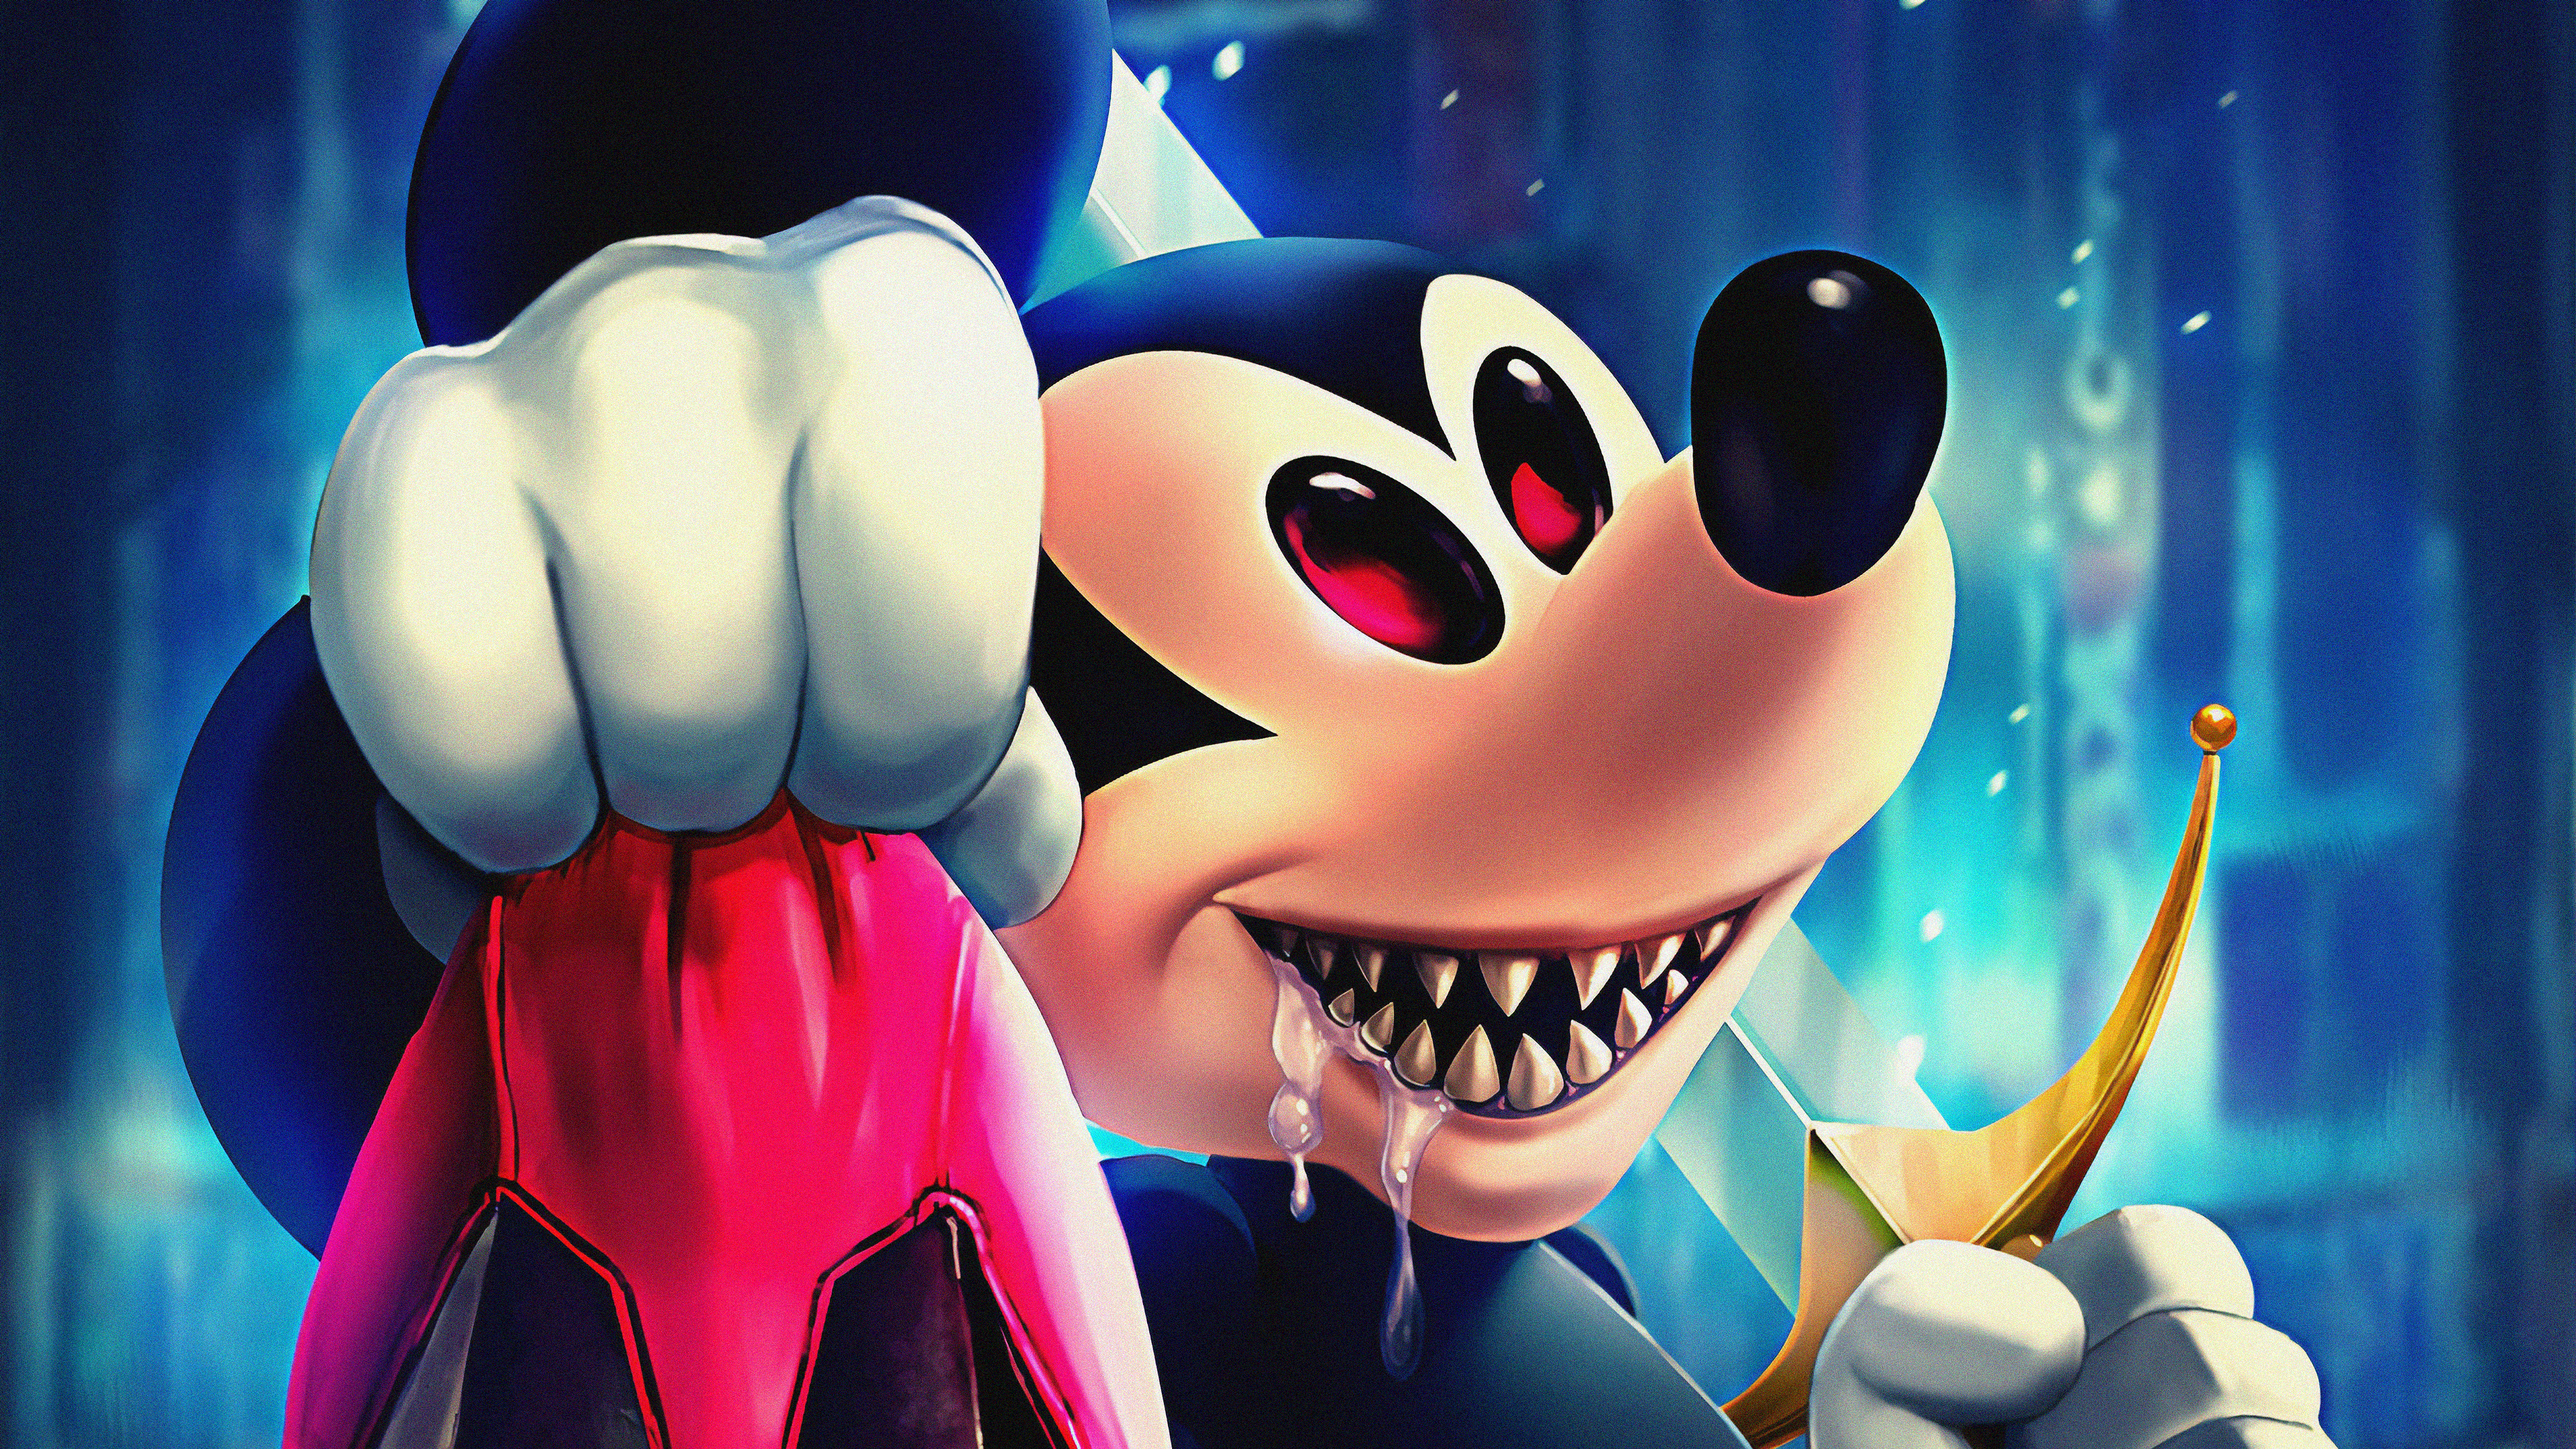 Evil Disney Evil Mickey Cartoons 4k Images